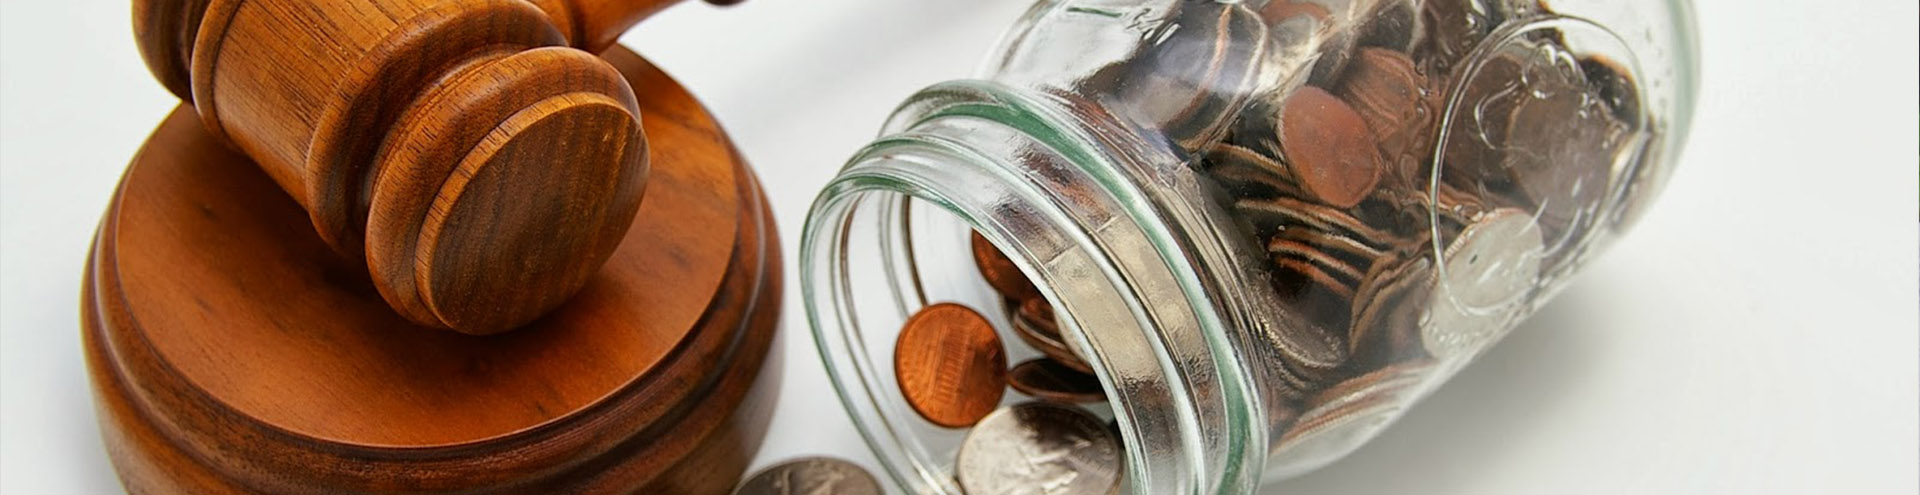 реализация имущества при банкротстве ИП в Уфе